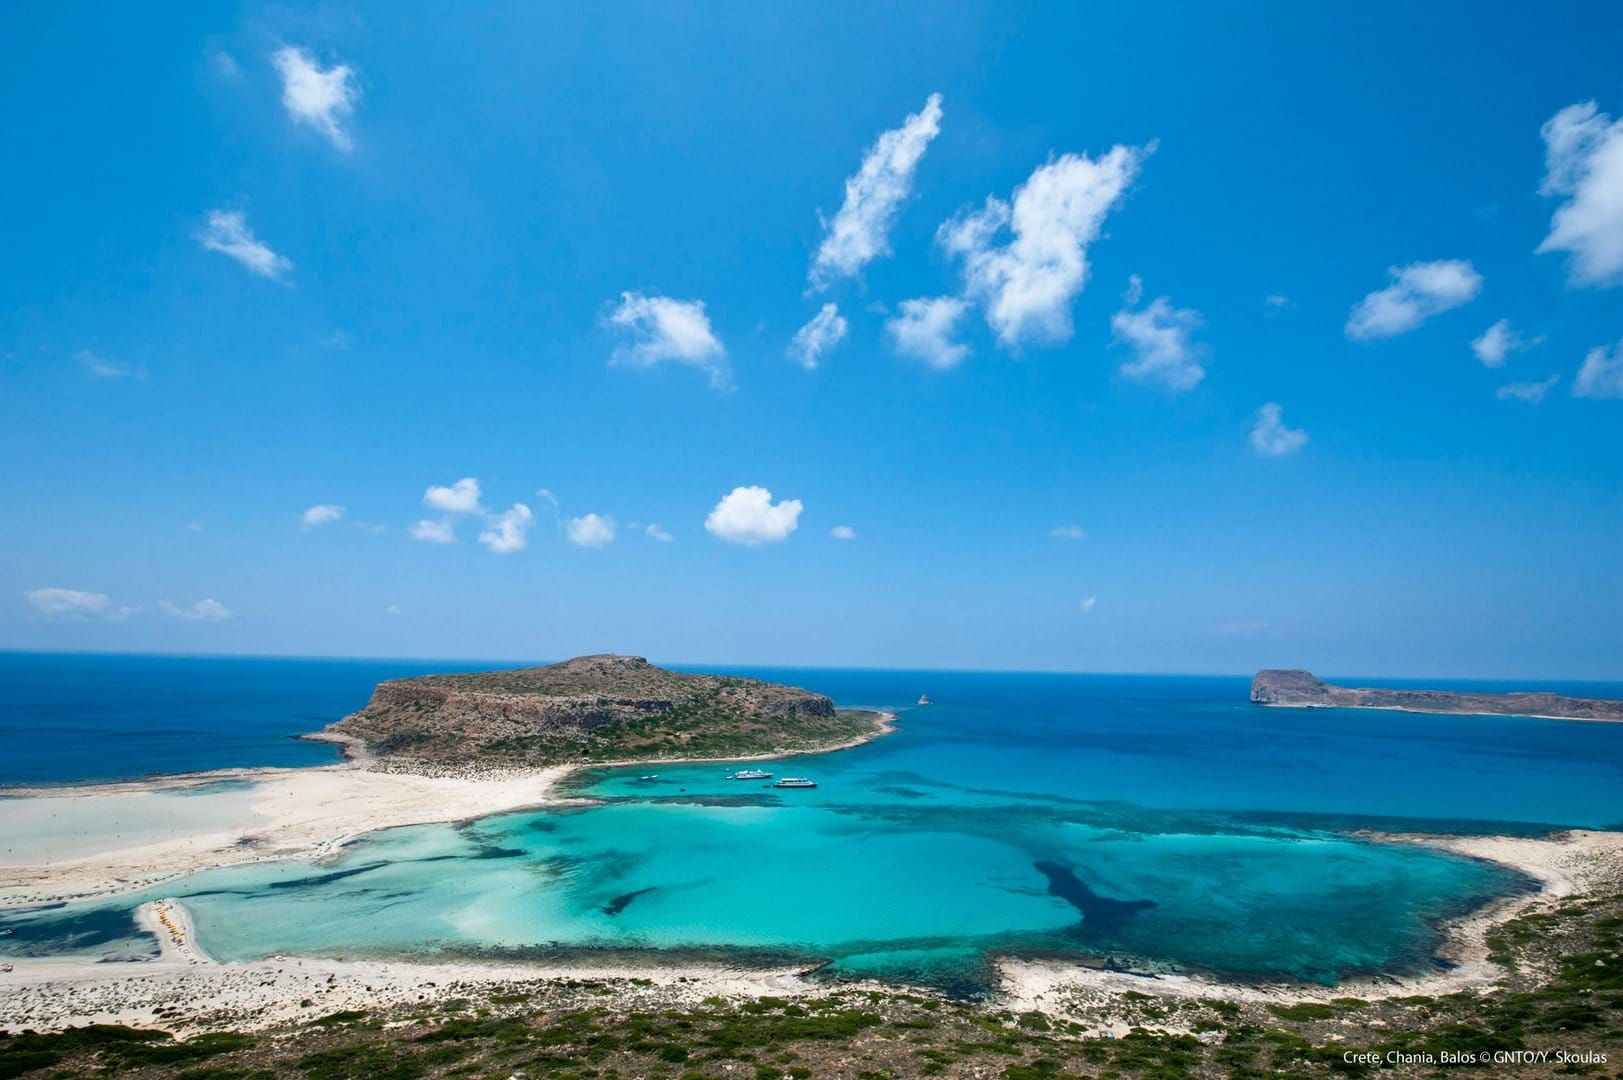 Balos, Chania - Crete